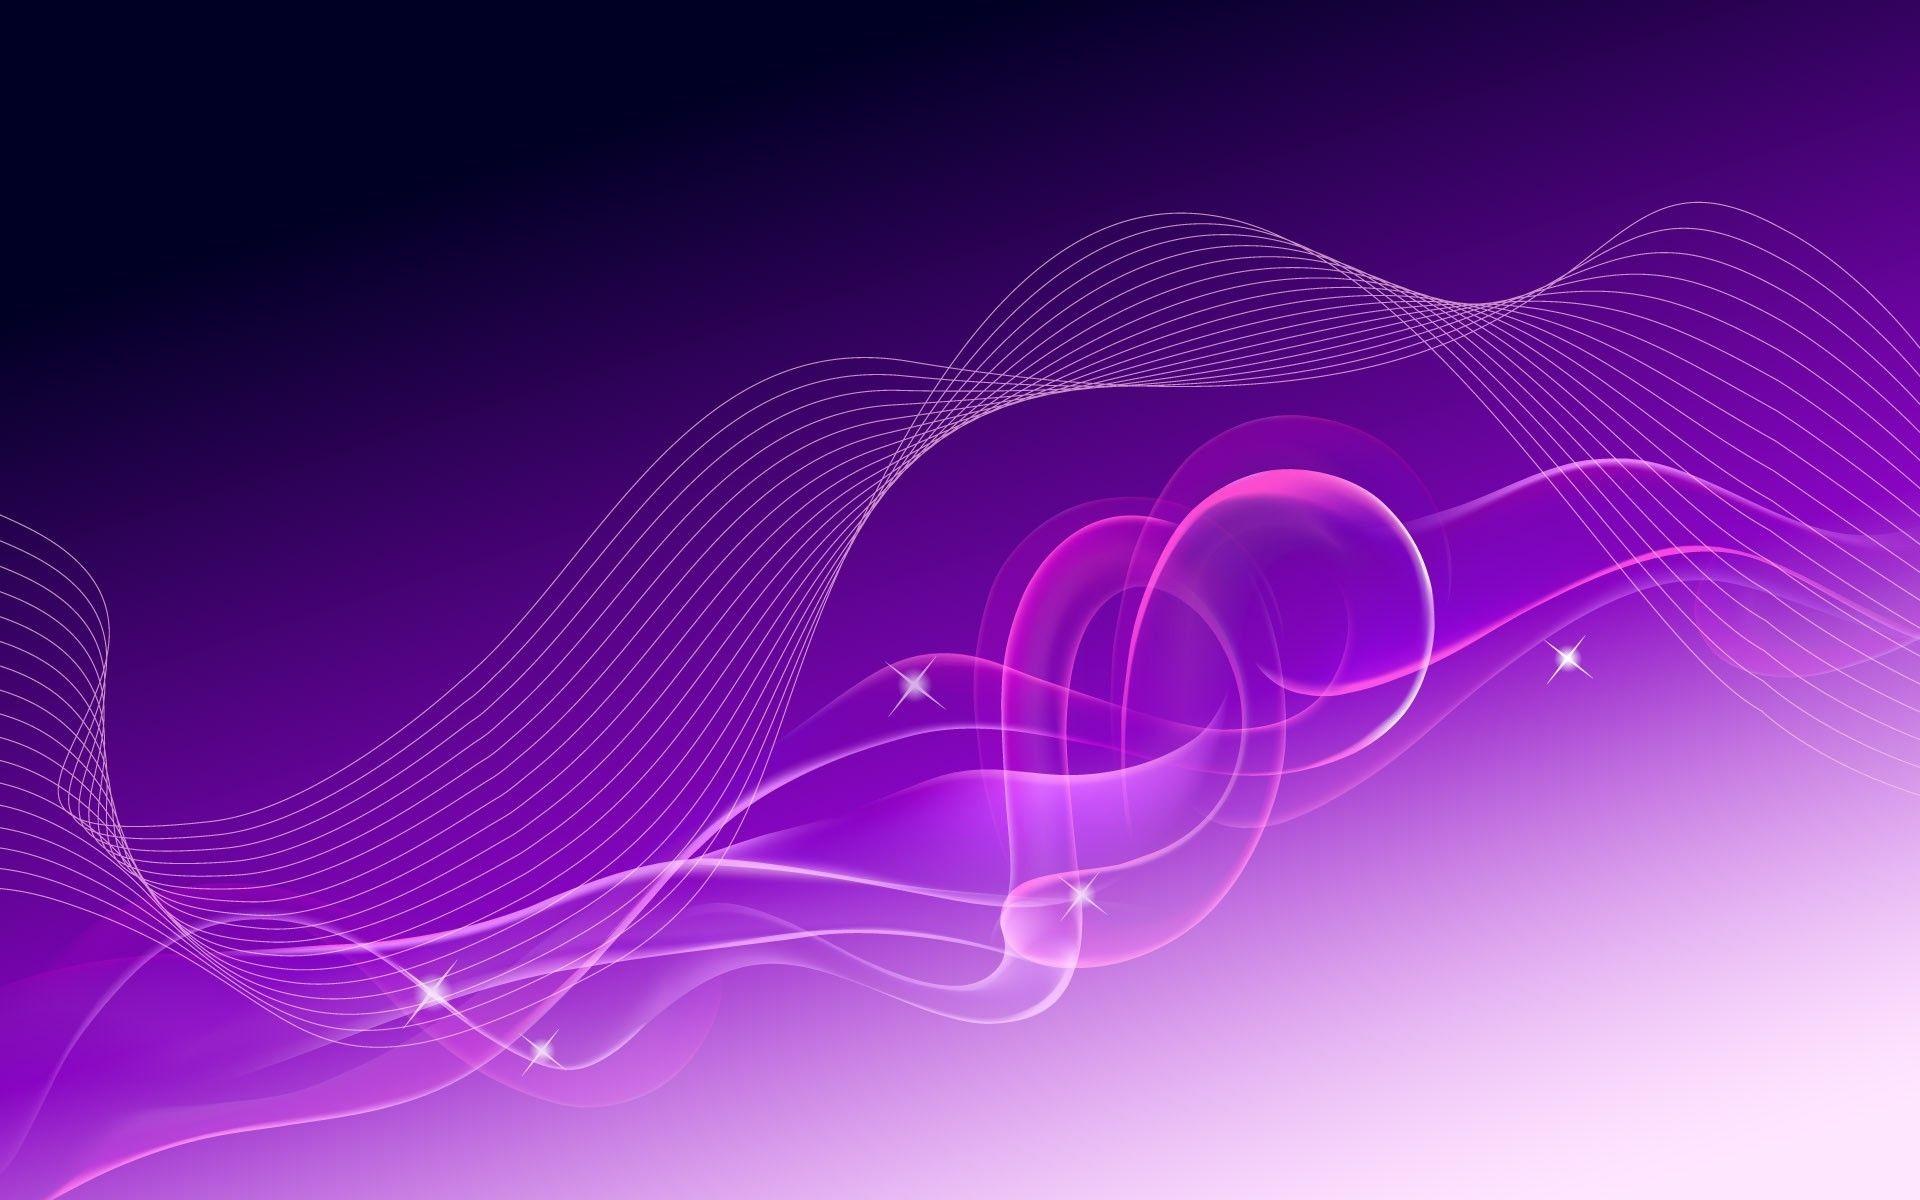 Purple Wallpaper Backgrounds Wallpapertag